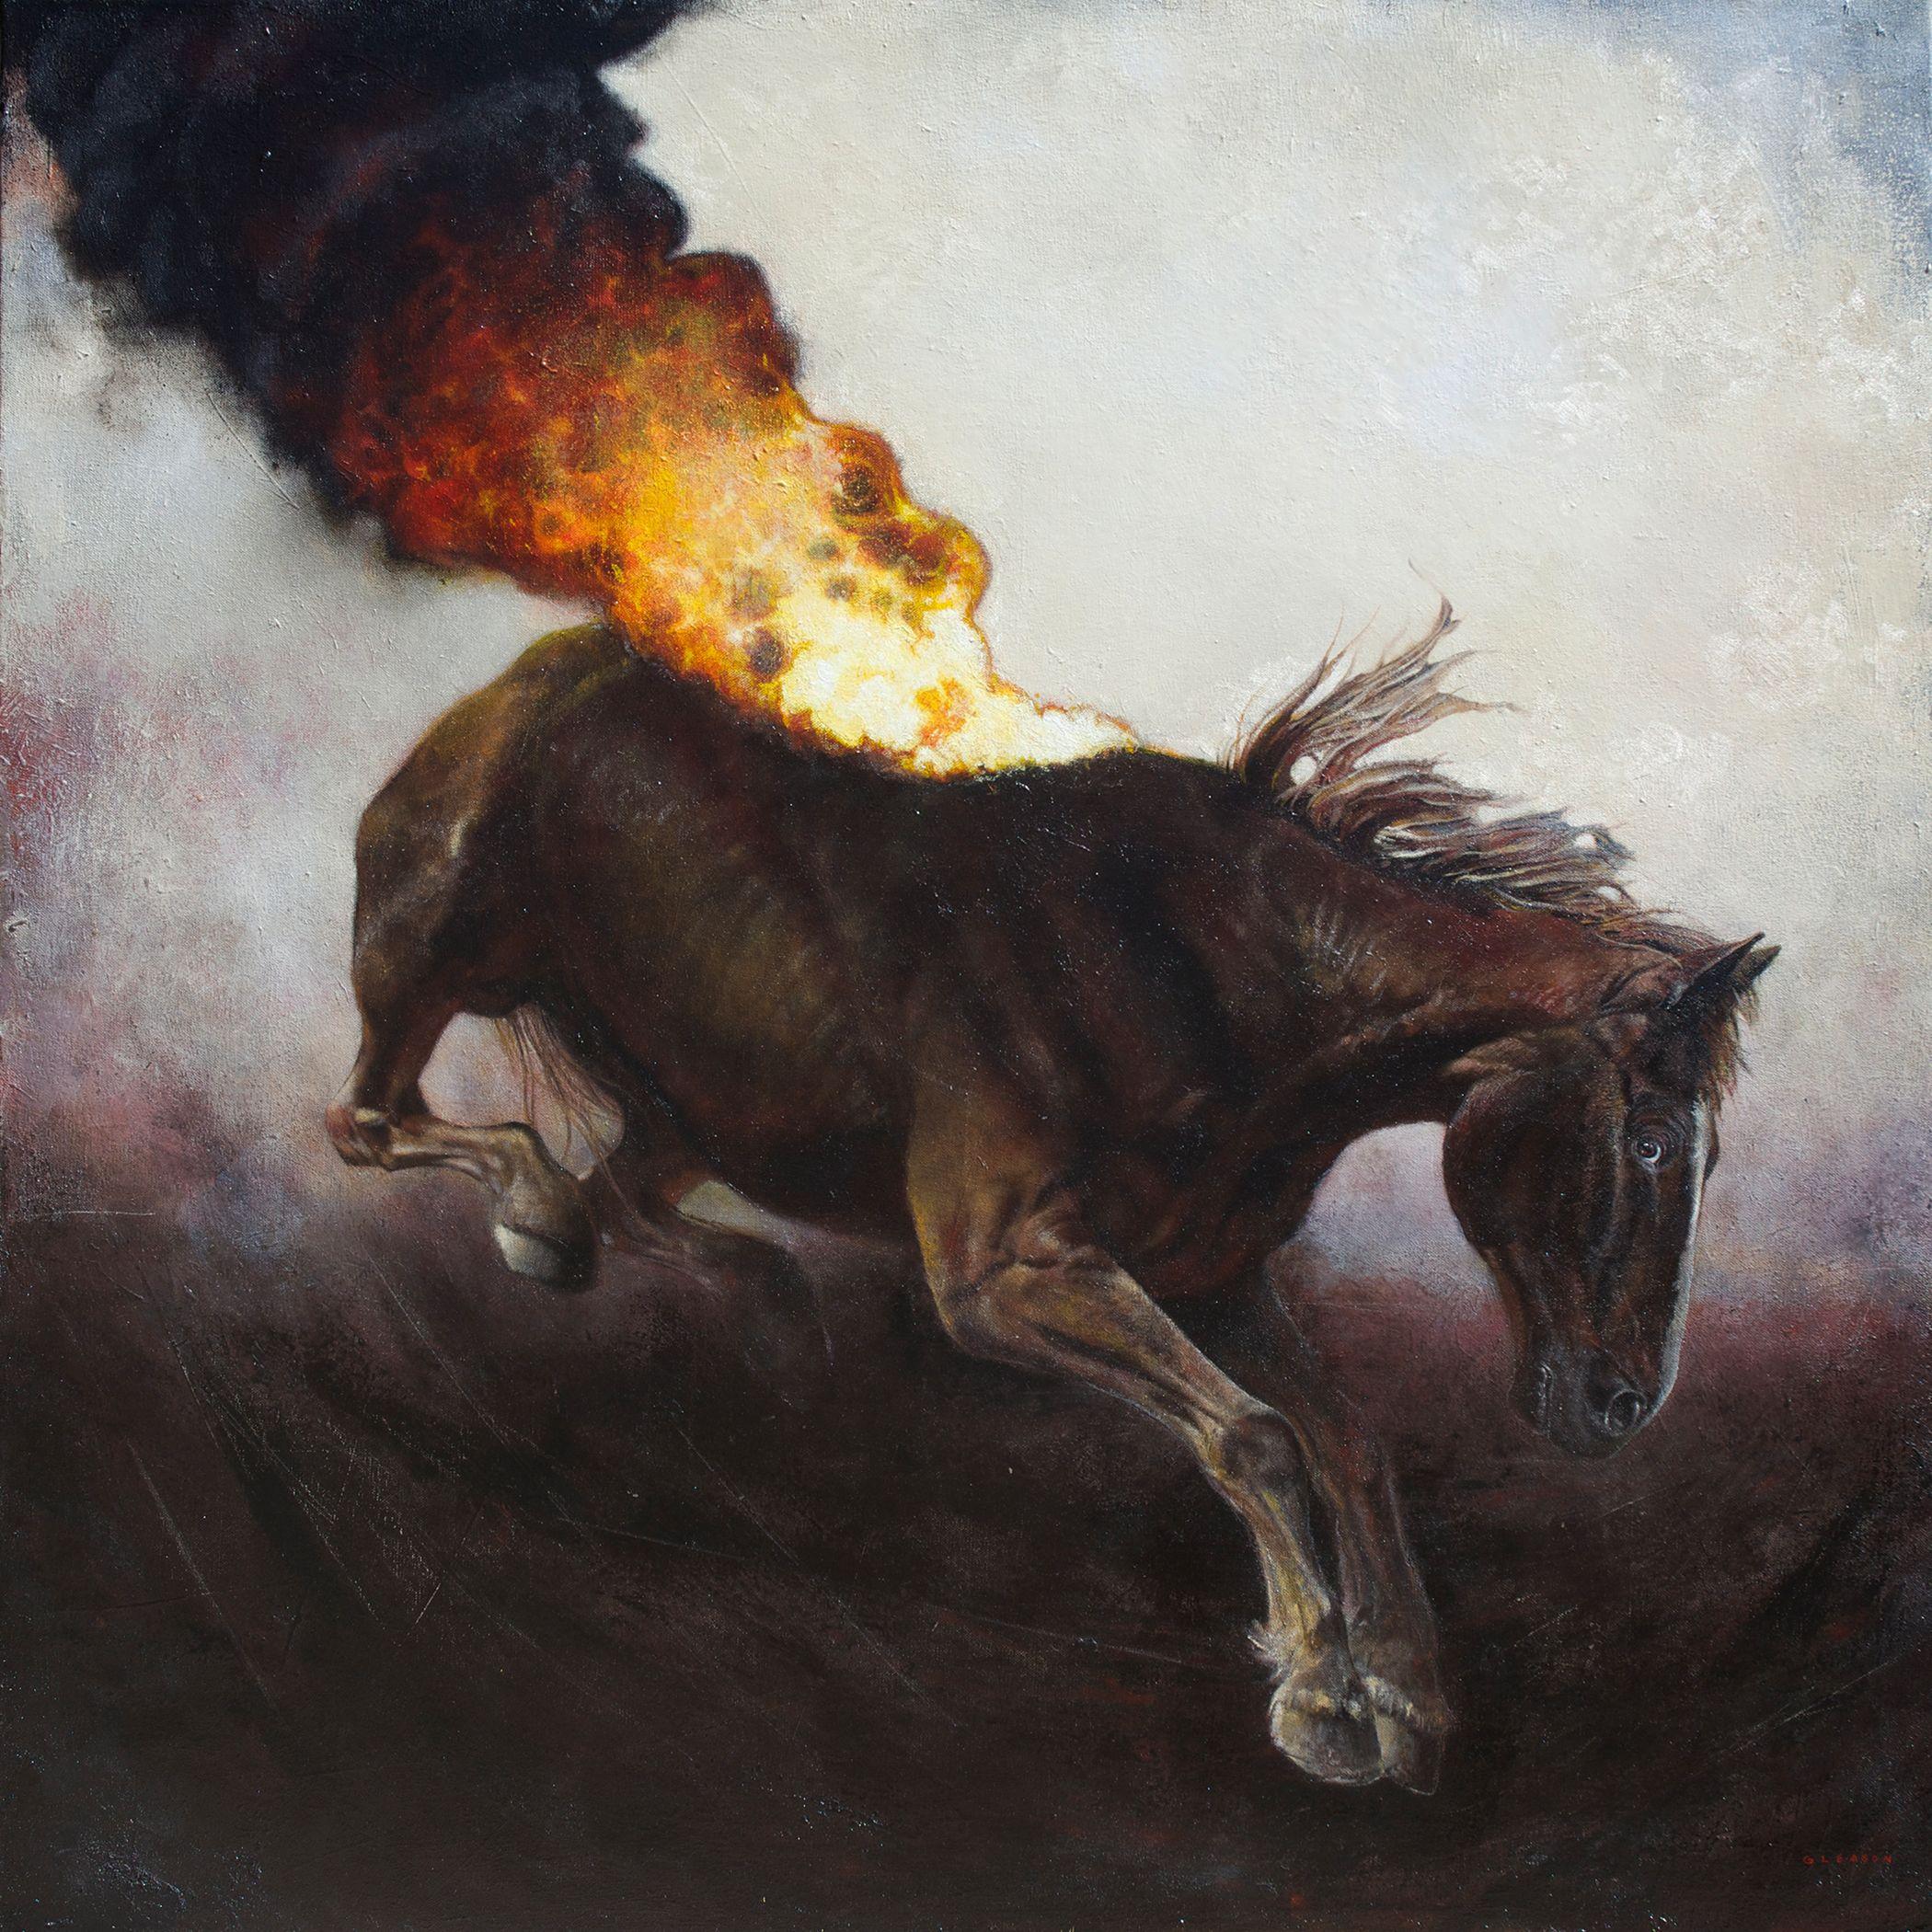 Gleason, Painting, Oil On Canvas